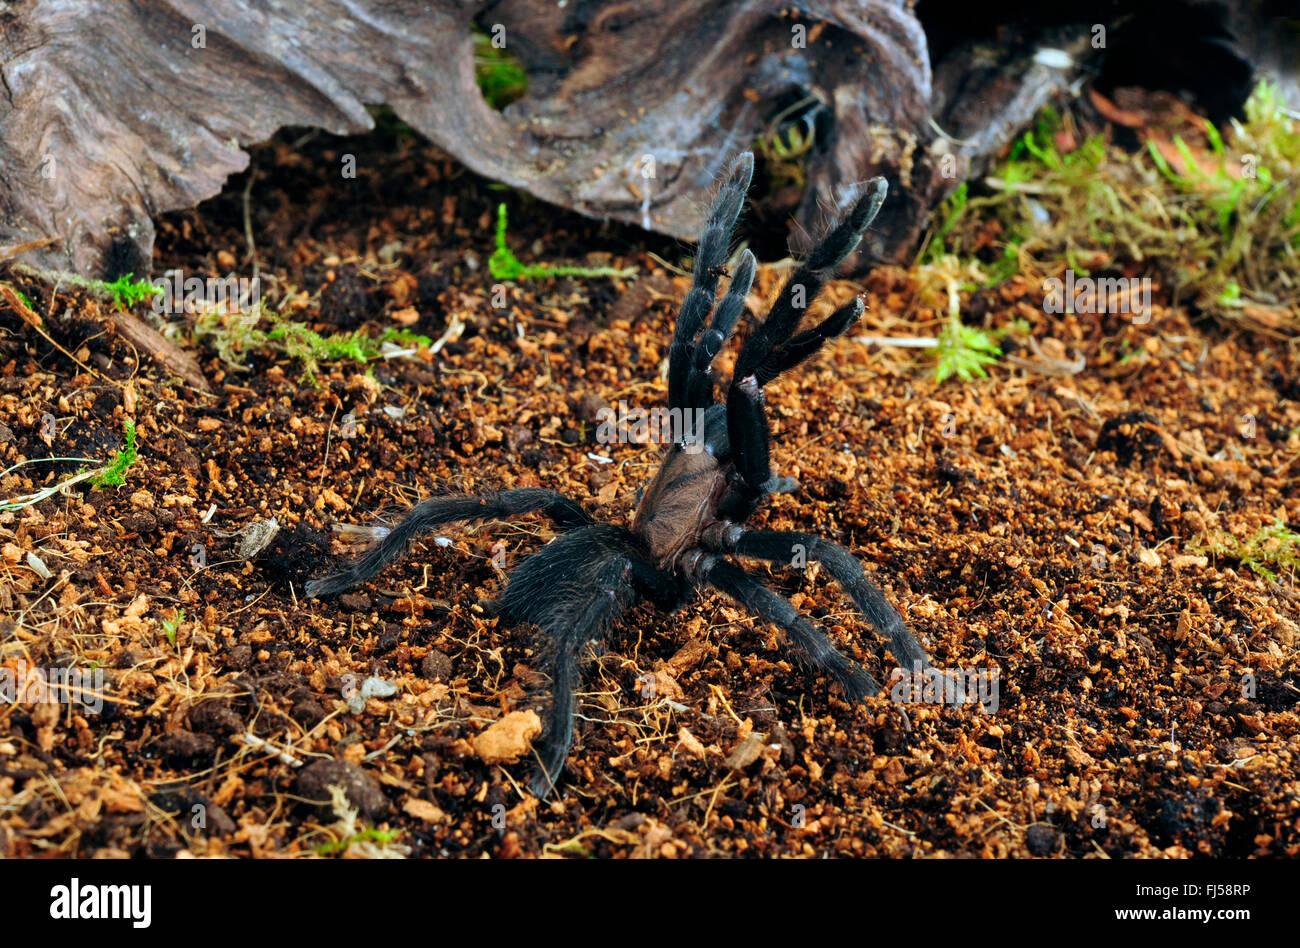 Filipino Gray Leg (Selenocosmia peerboomi), endemic birdspider from the Philippines in defense posture, Philippines, - Stock Image